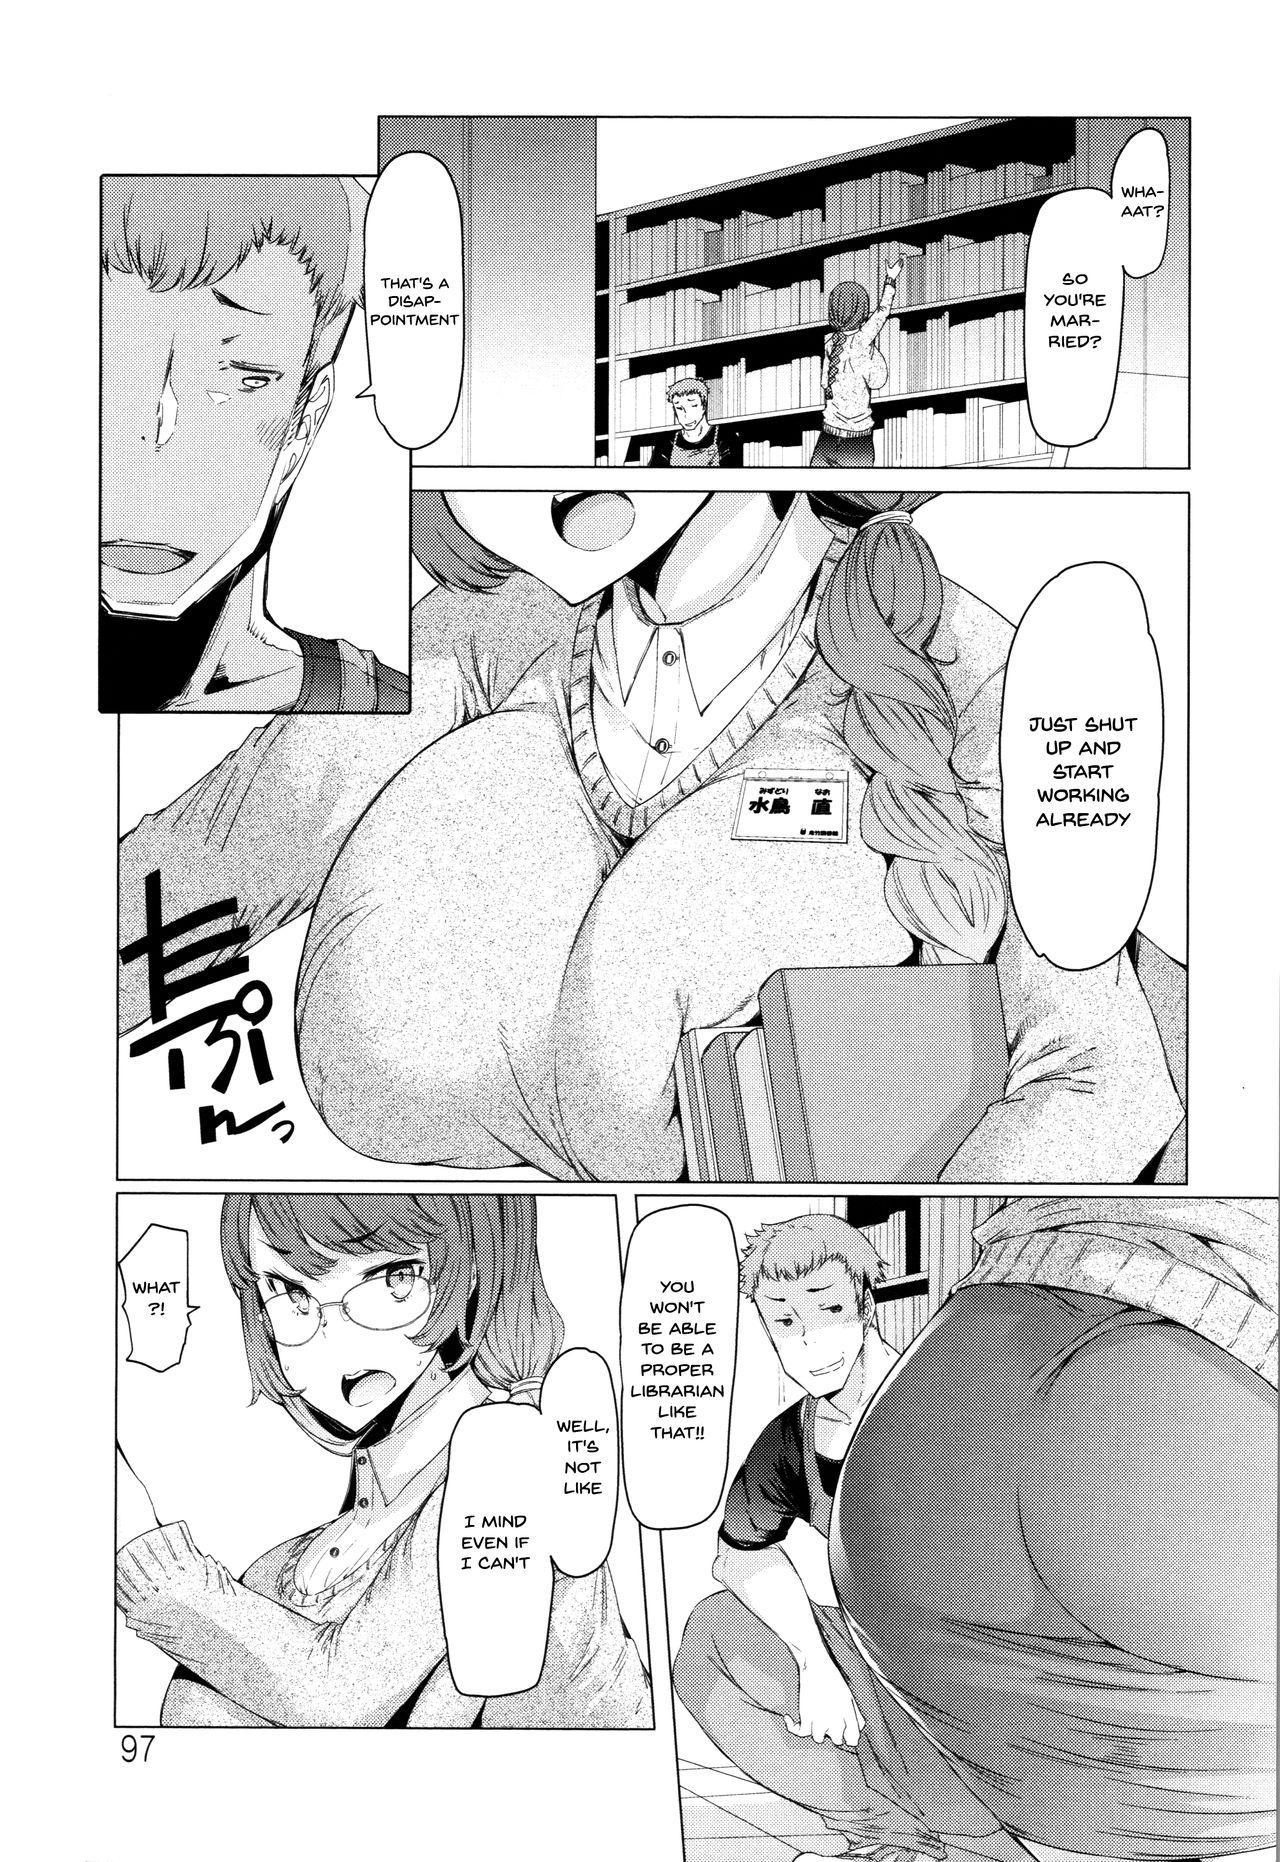 Hitozuma ga Ero Sugite Shigoto ni Naranai! | These Housewives Are Too Lewd I Can't Help It! 96